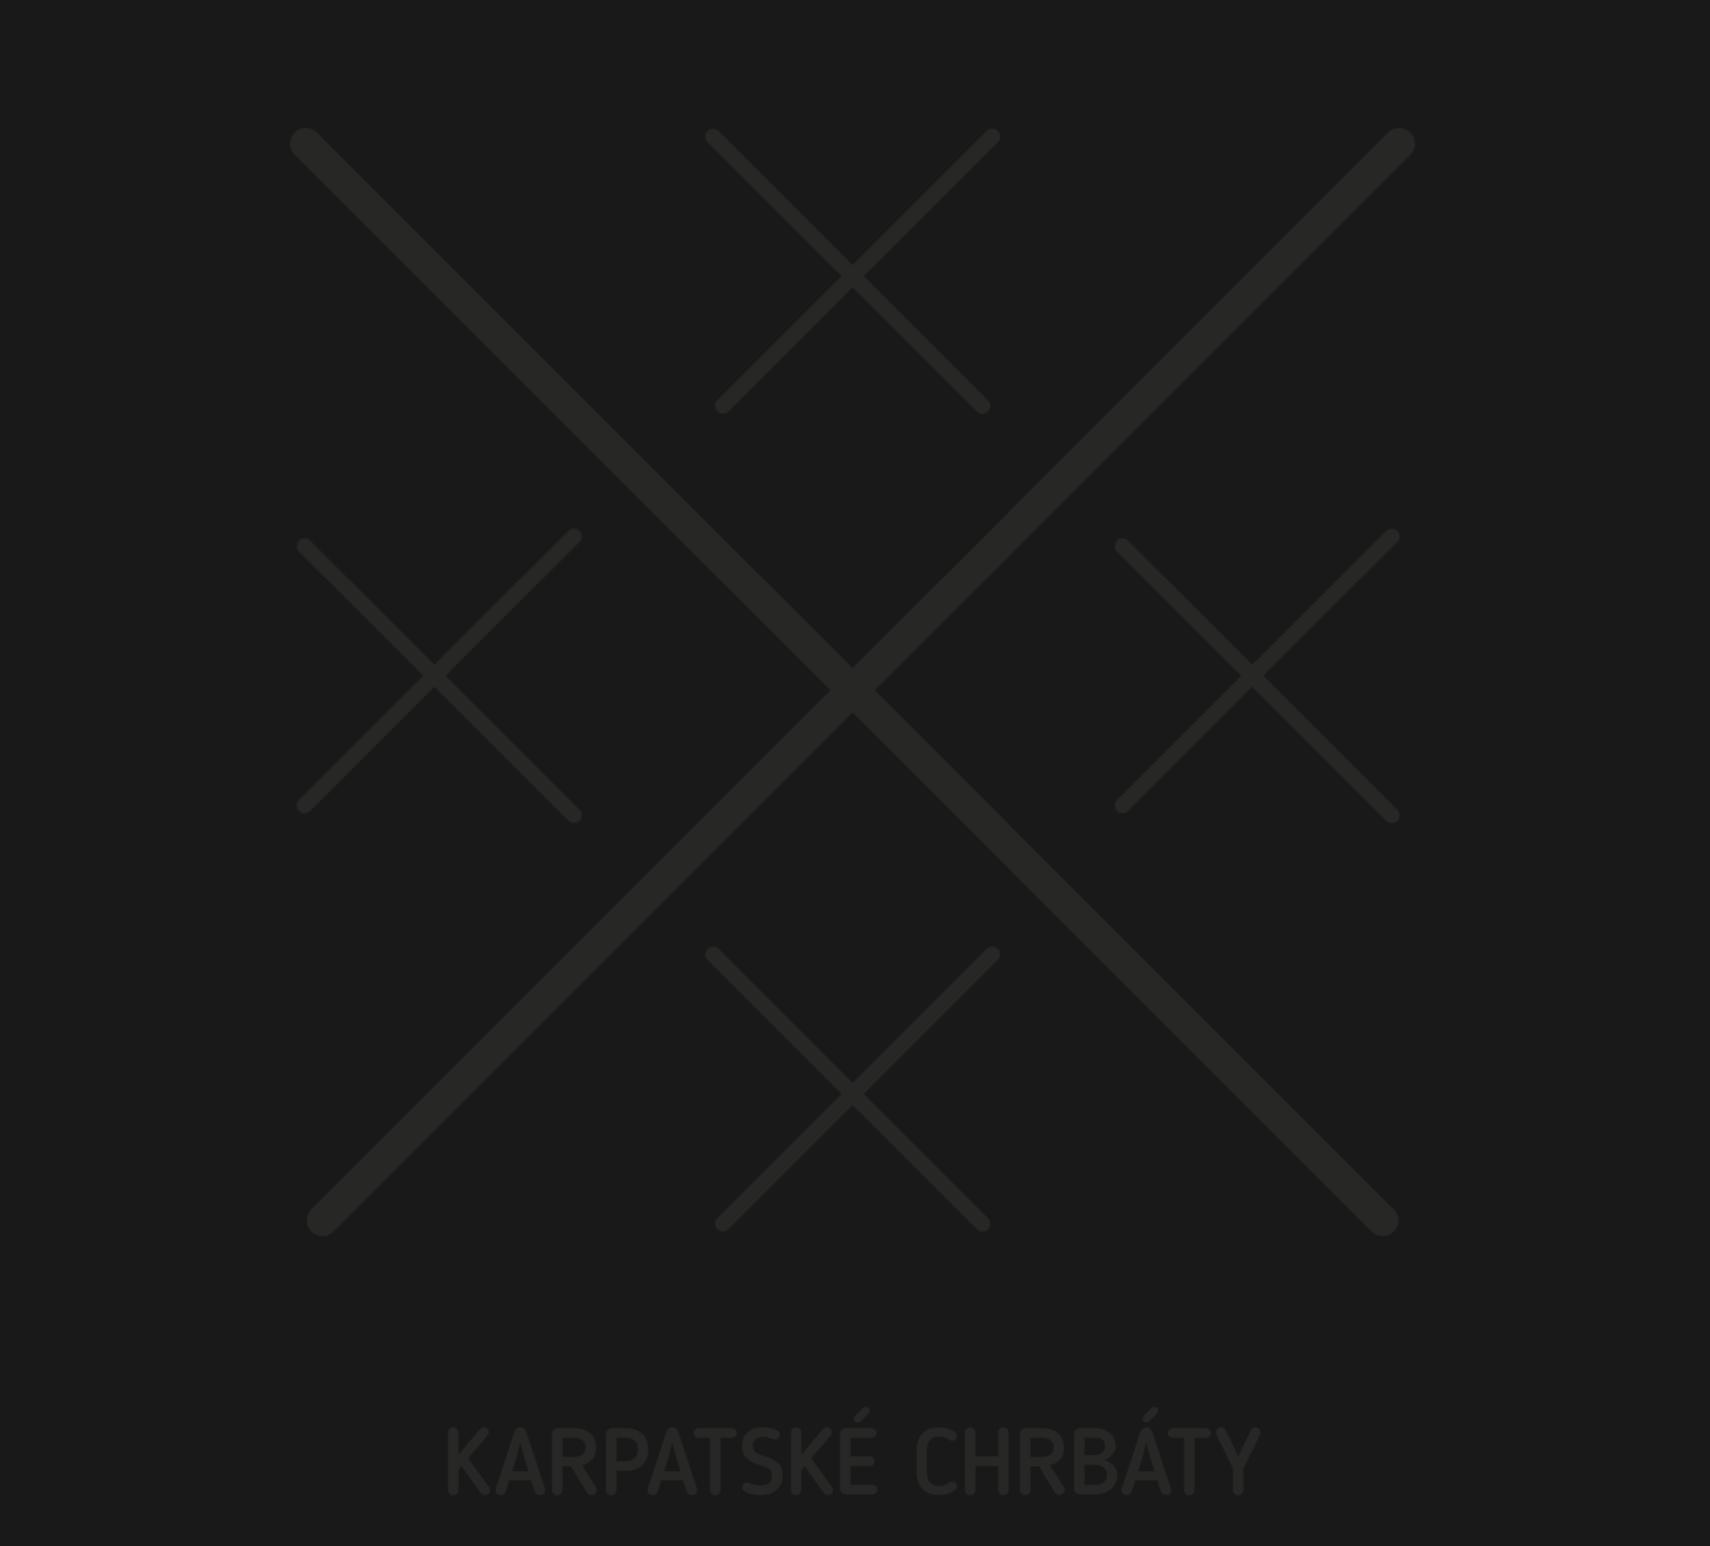 karpatske_chrbaty